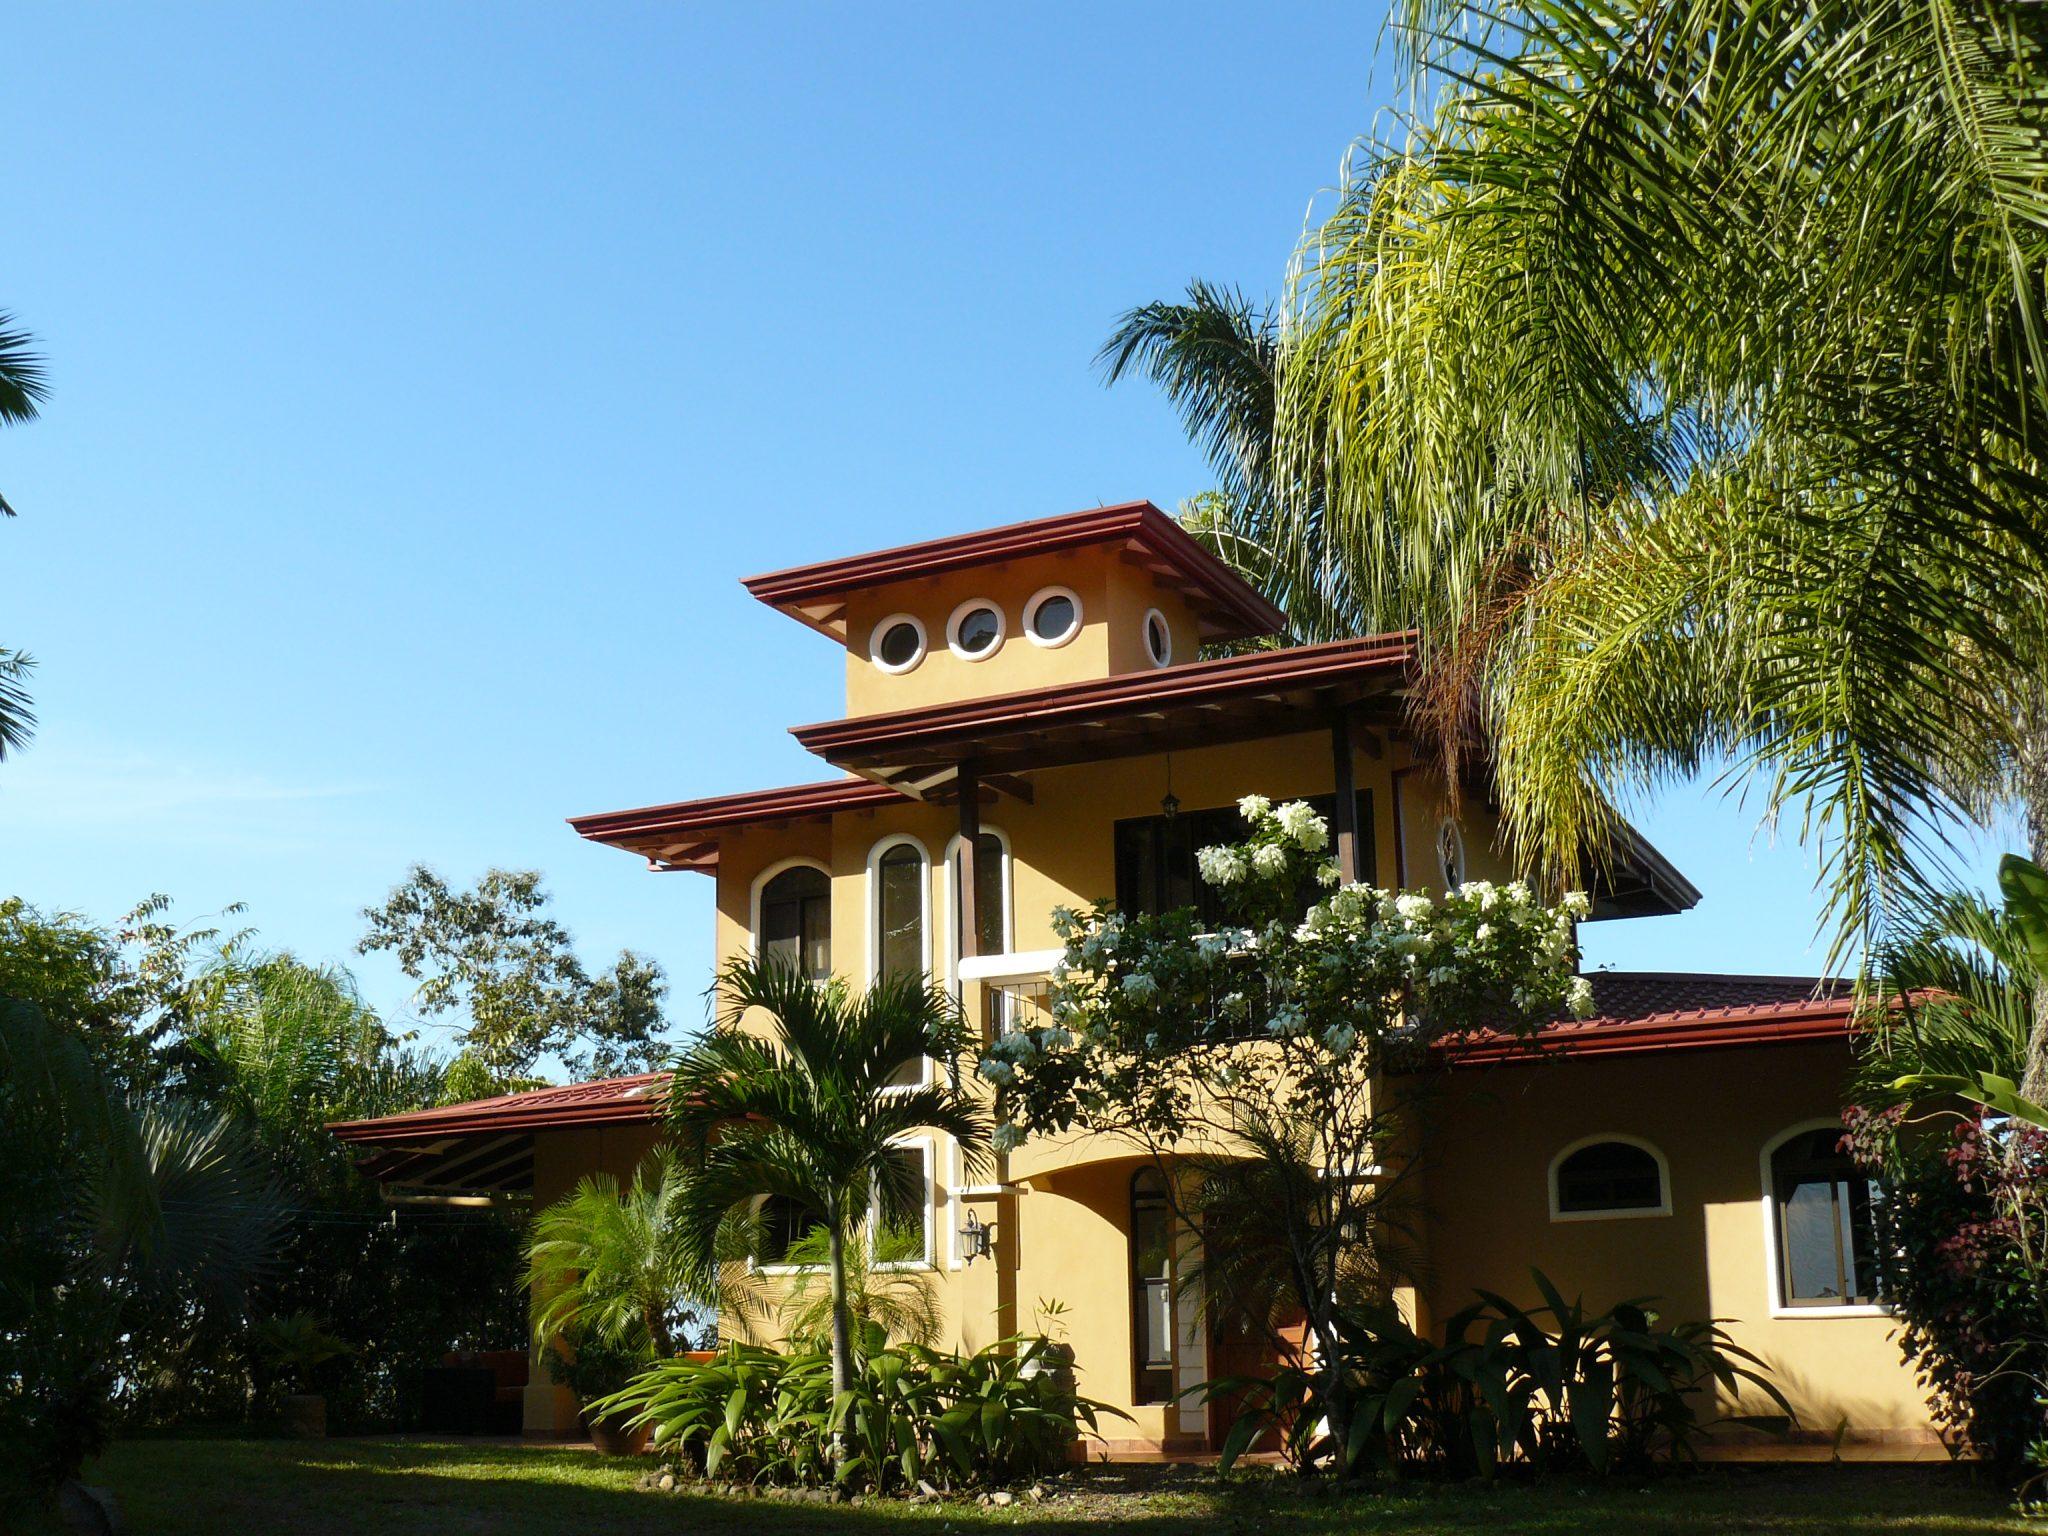 0.86 ACRE - Income Property Dream Home!!!